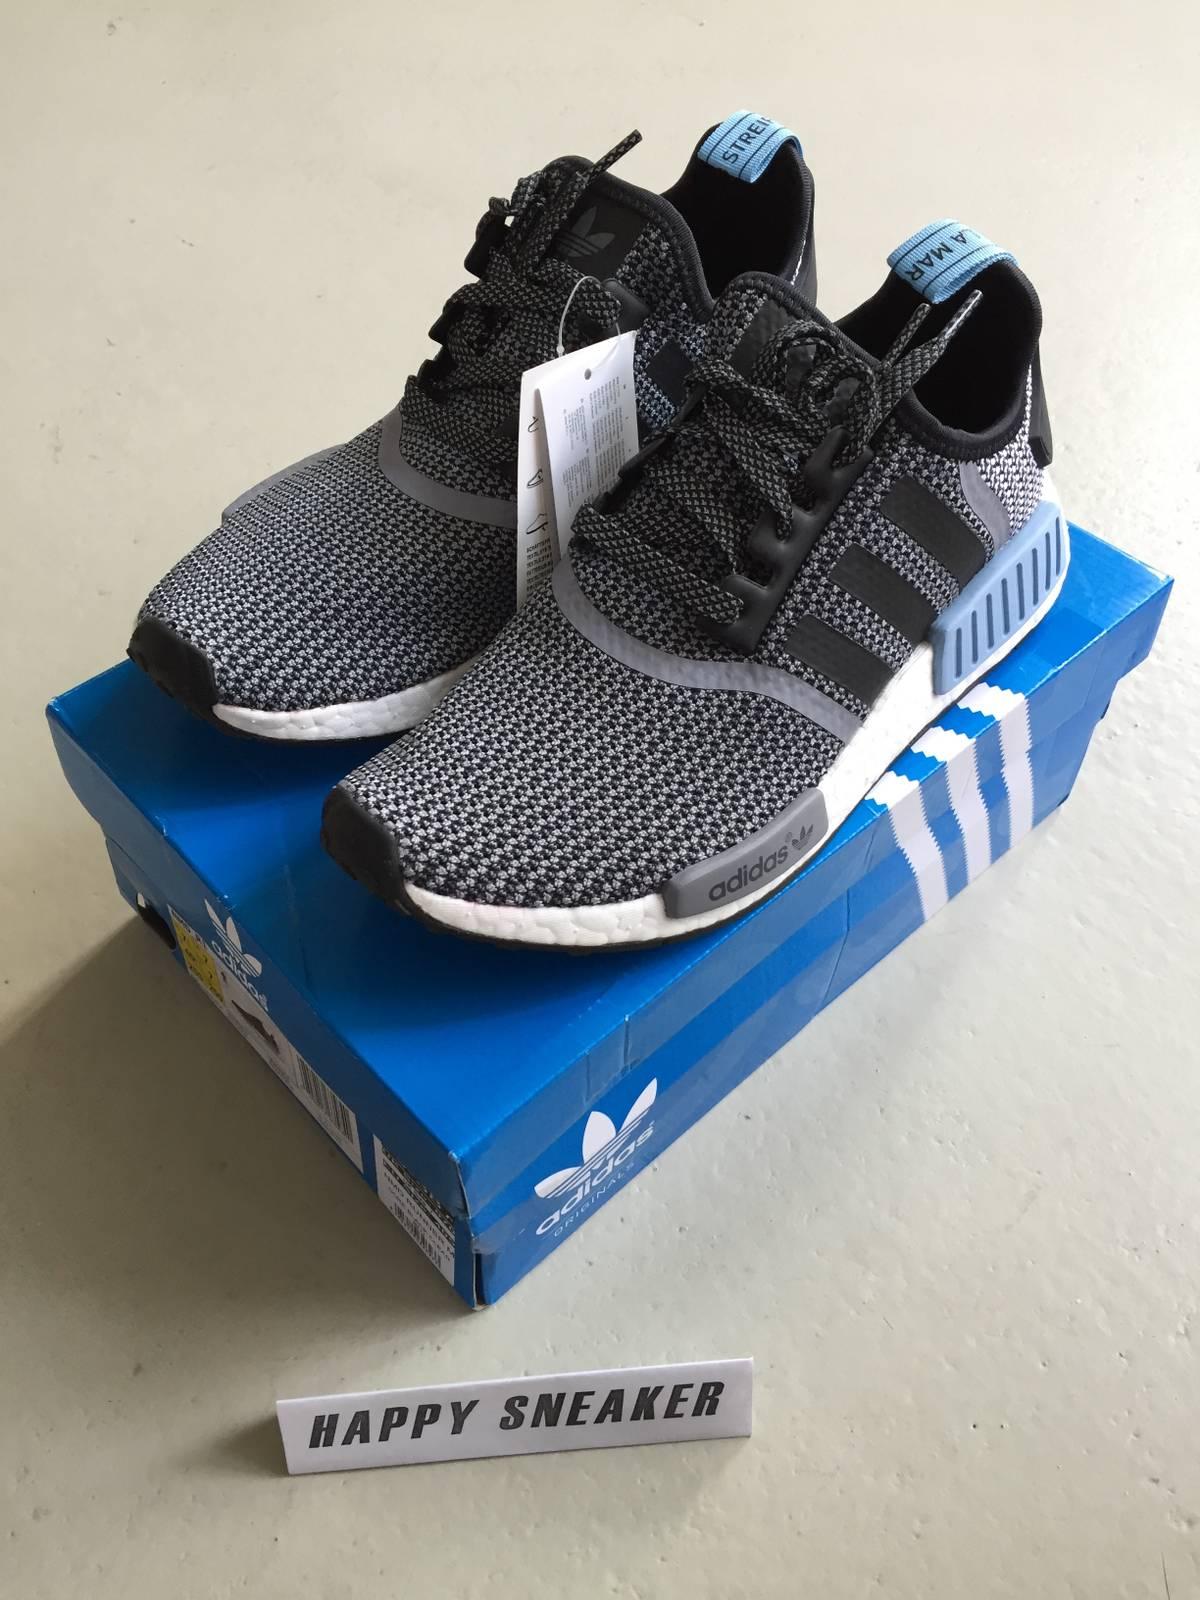 7a662ab58 Adidas NMD R1 Mesh  Black Charcoal  Core Black S31504